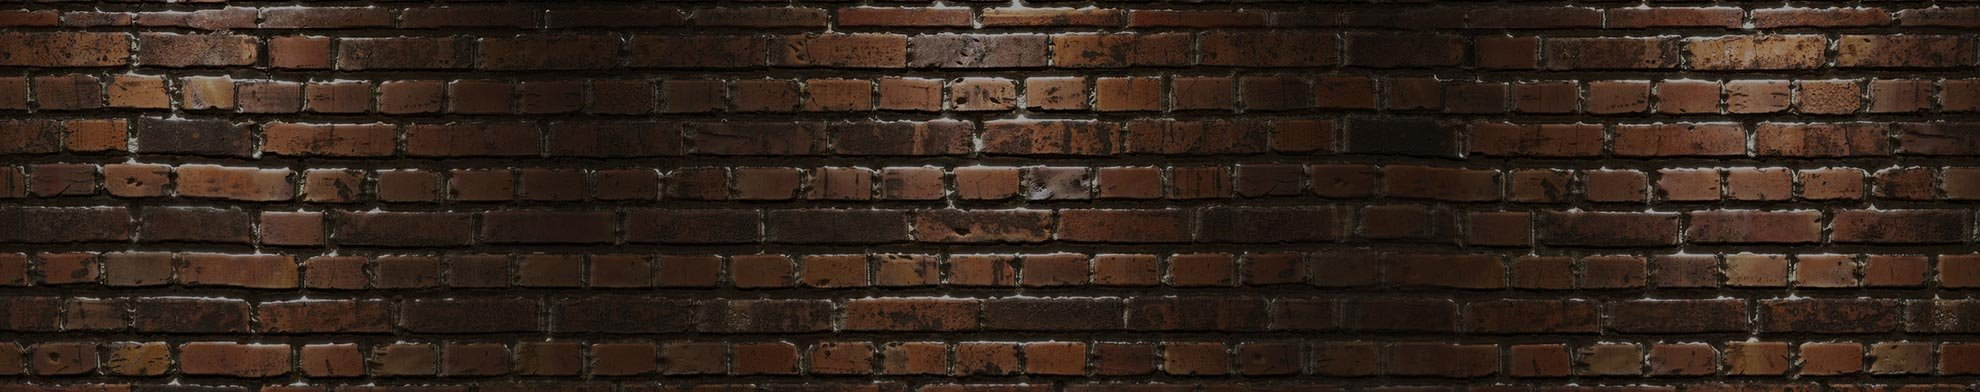 BrickWall-Darkbig_edited.jpg